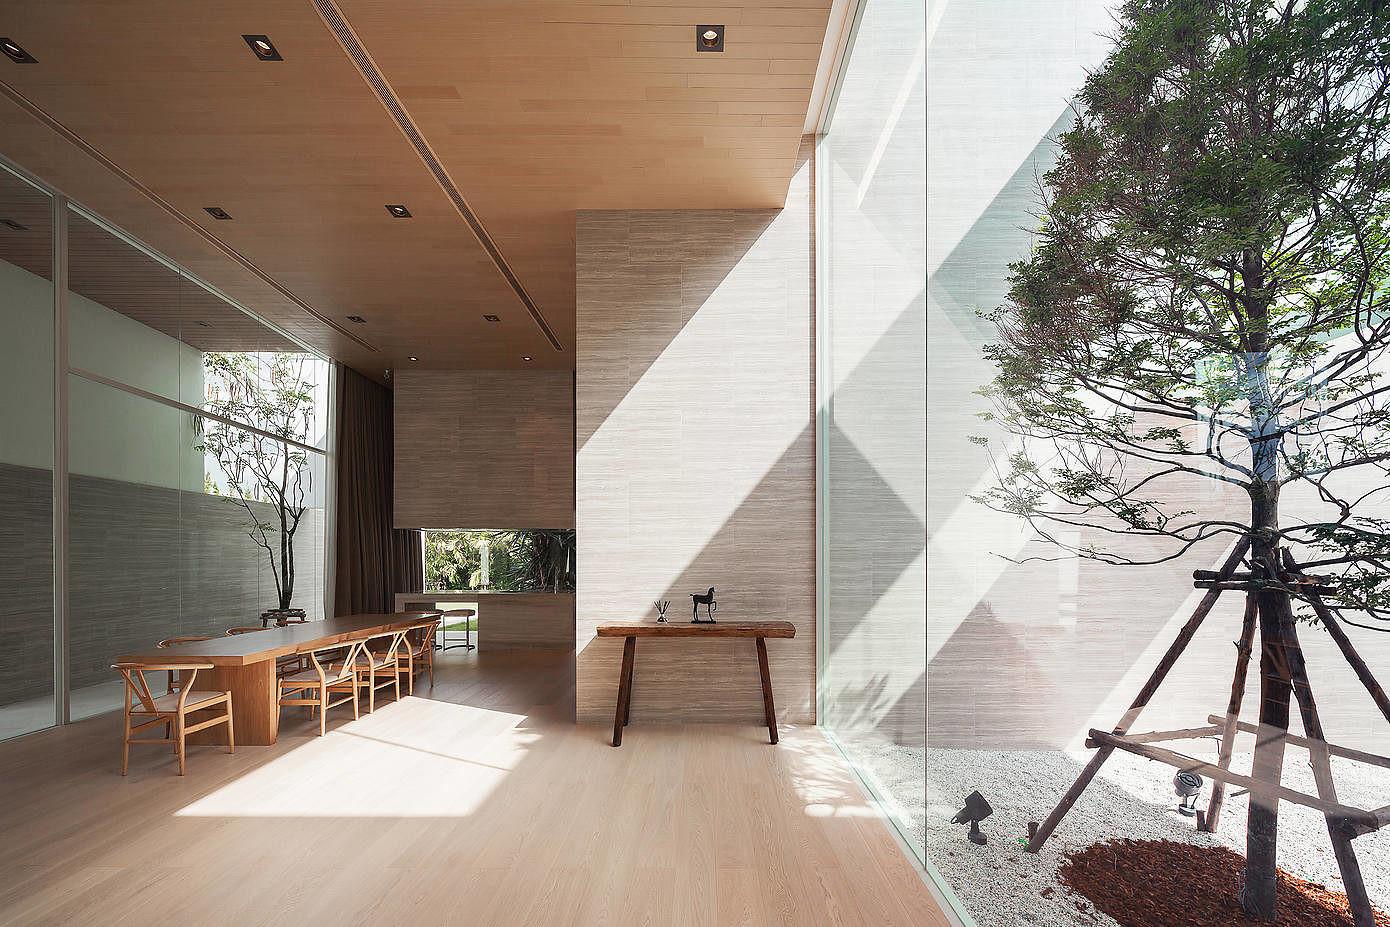 PA House by Idin Architects